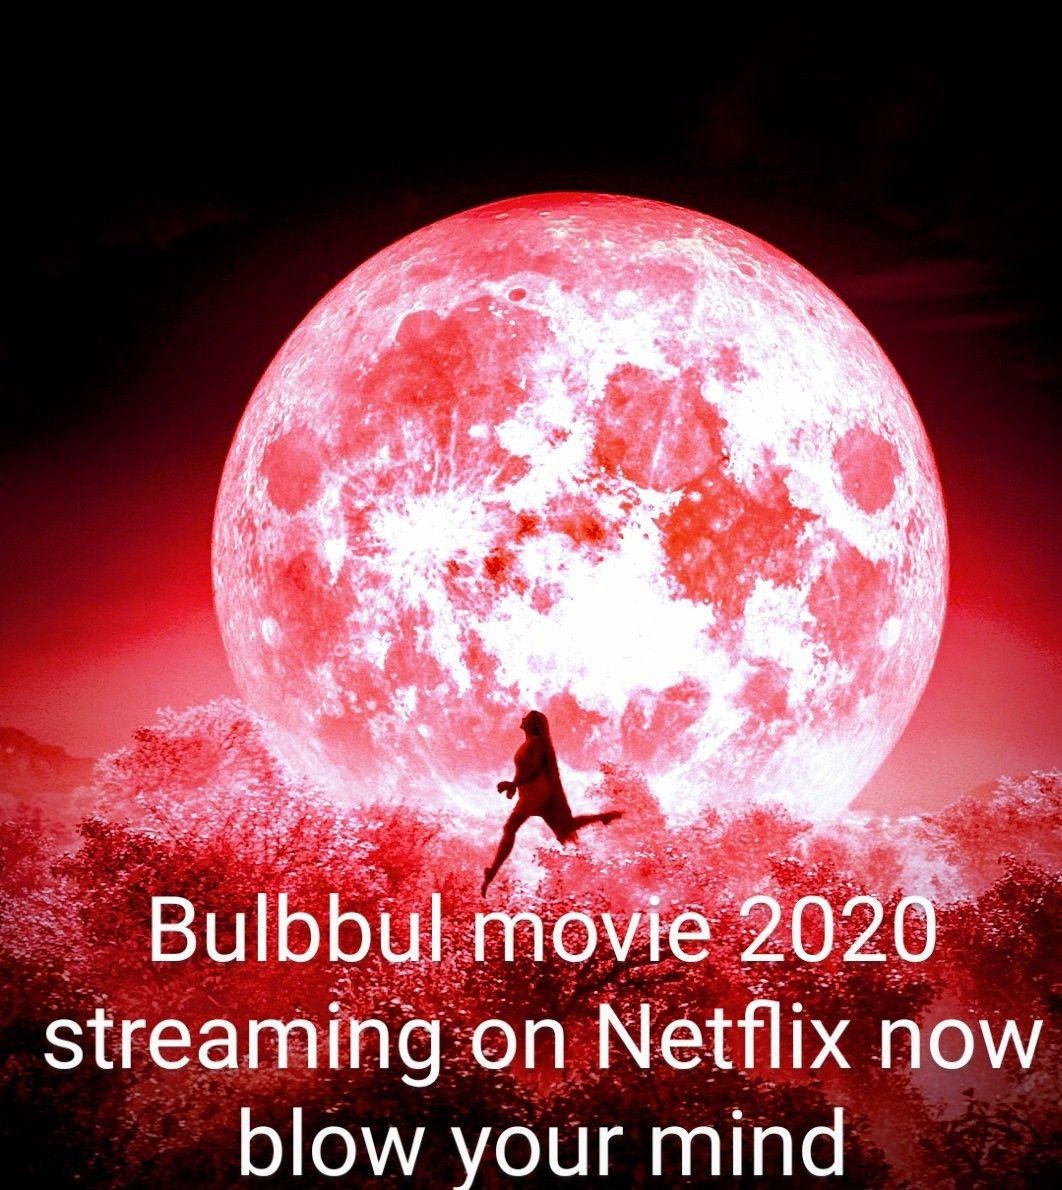 Bulbbul Movie 2020 Streaming On Netflix Now Blow Your Mind Netflix Streaming Netflix Drama Film